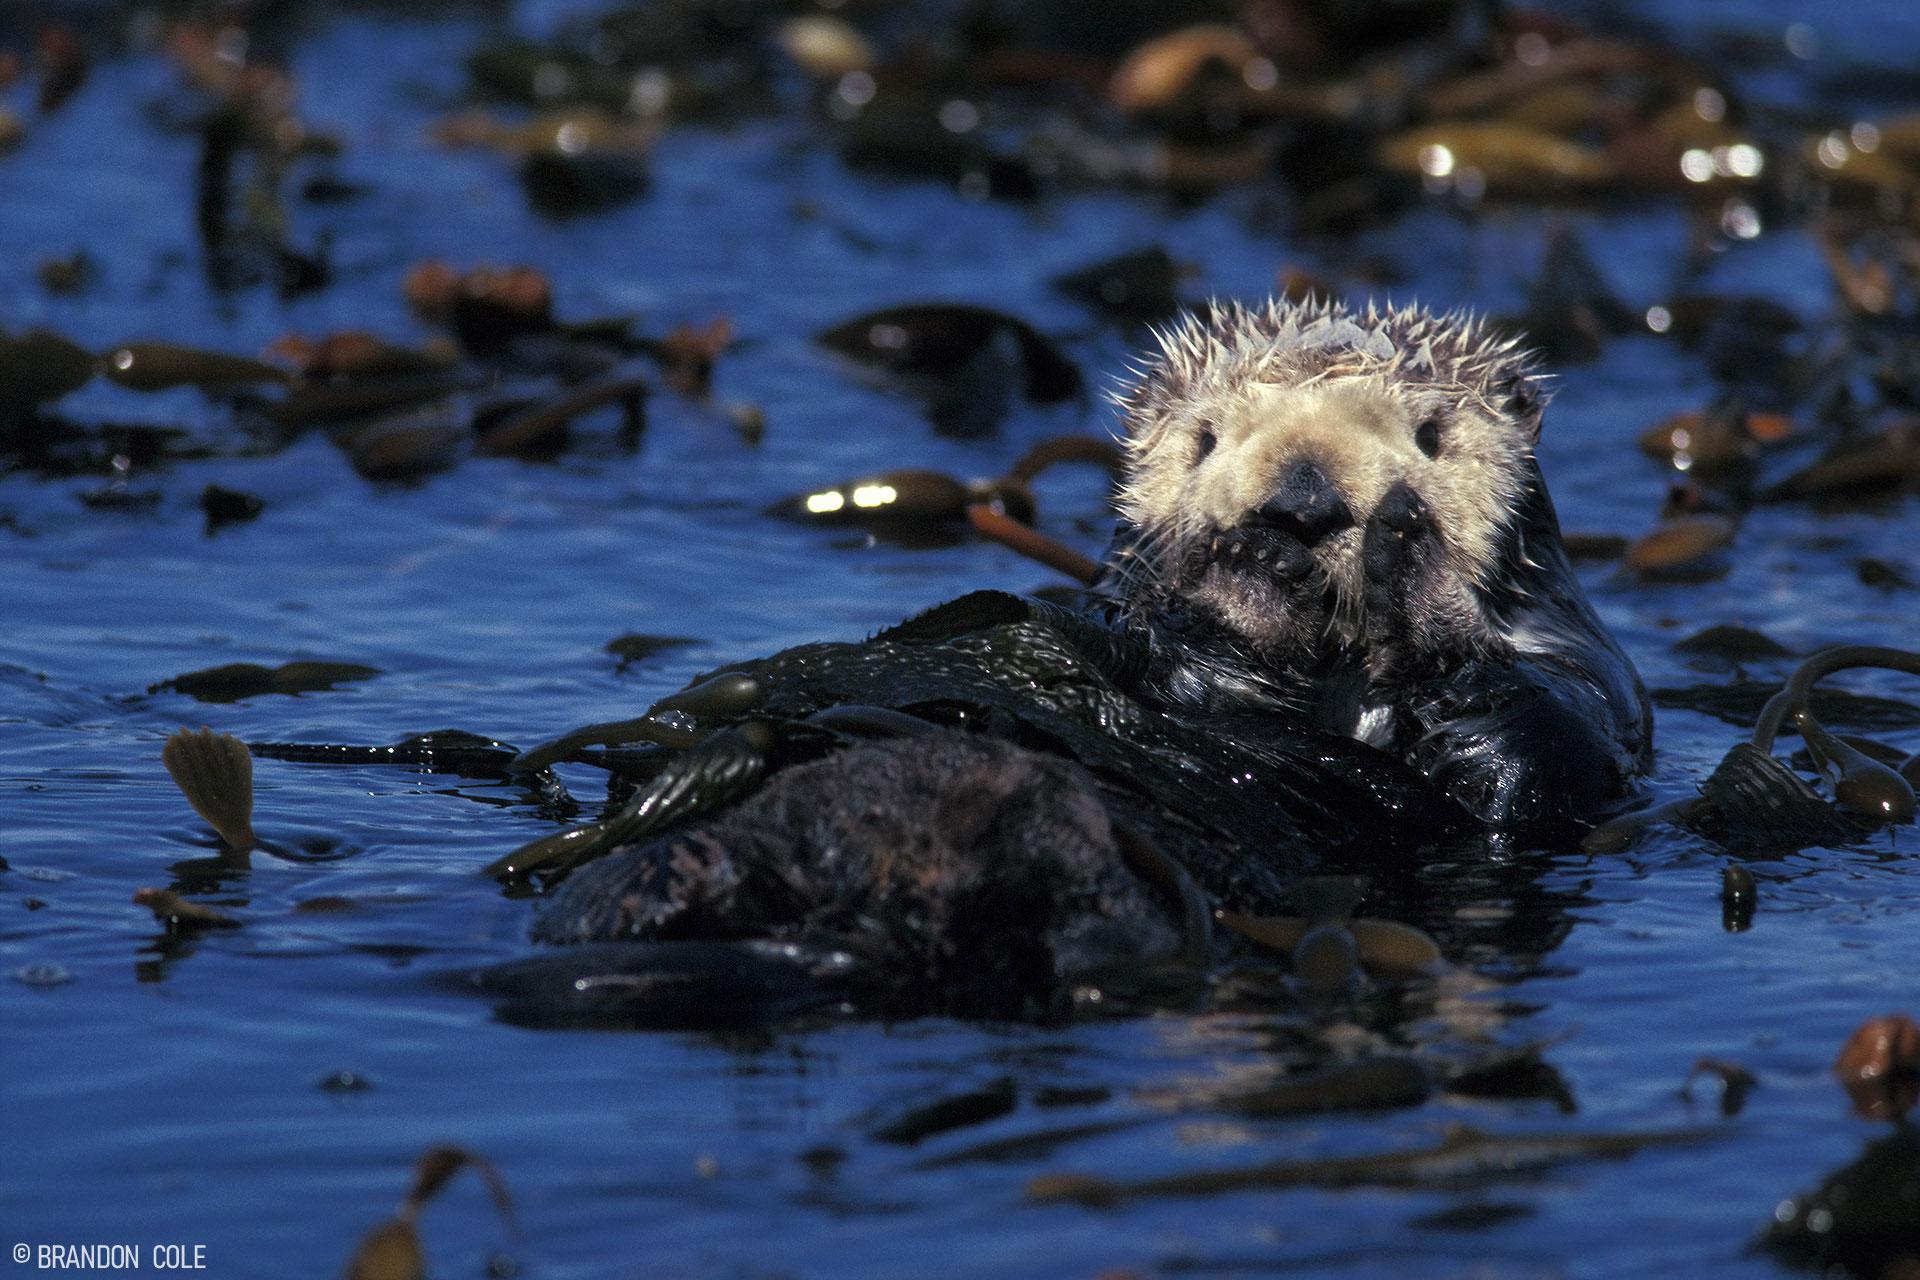 A sea otter floats on its back.